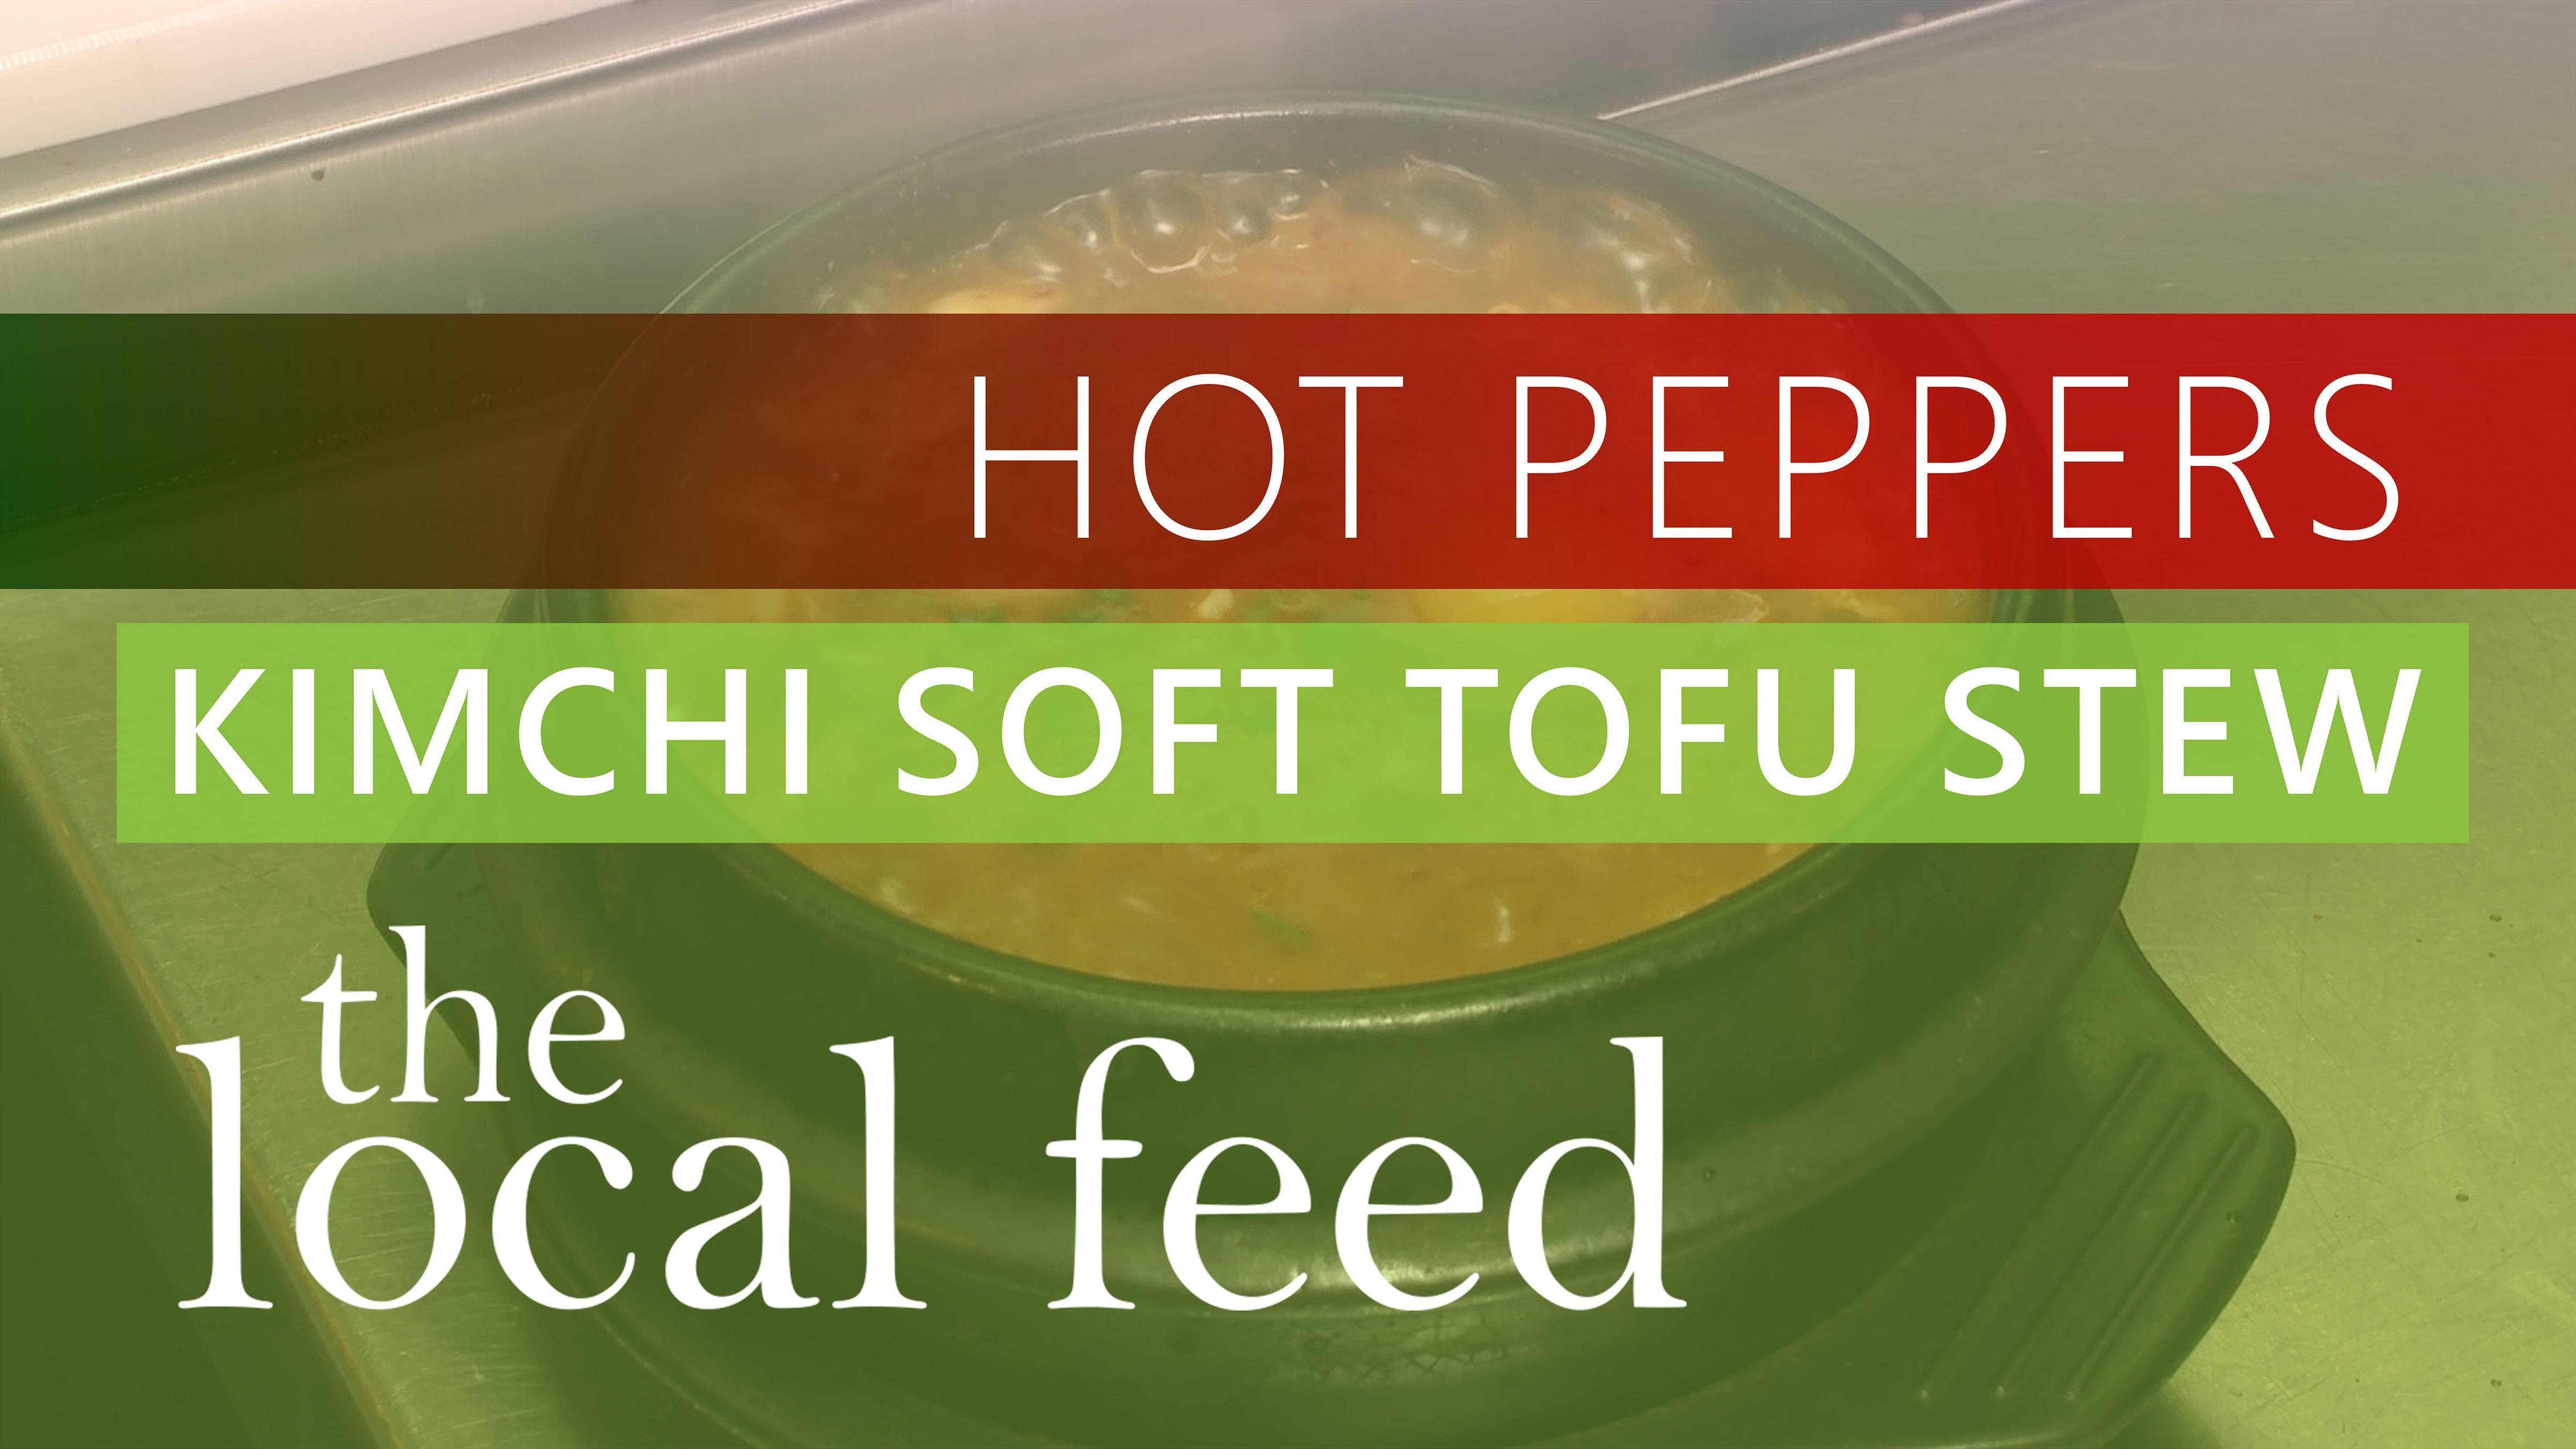 Kimchi Soft Tofu Stew